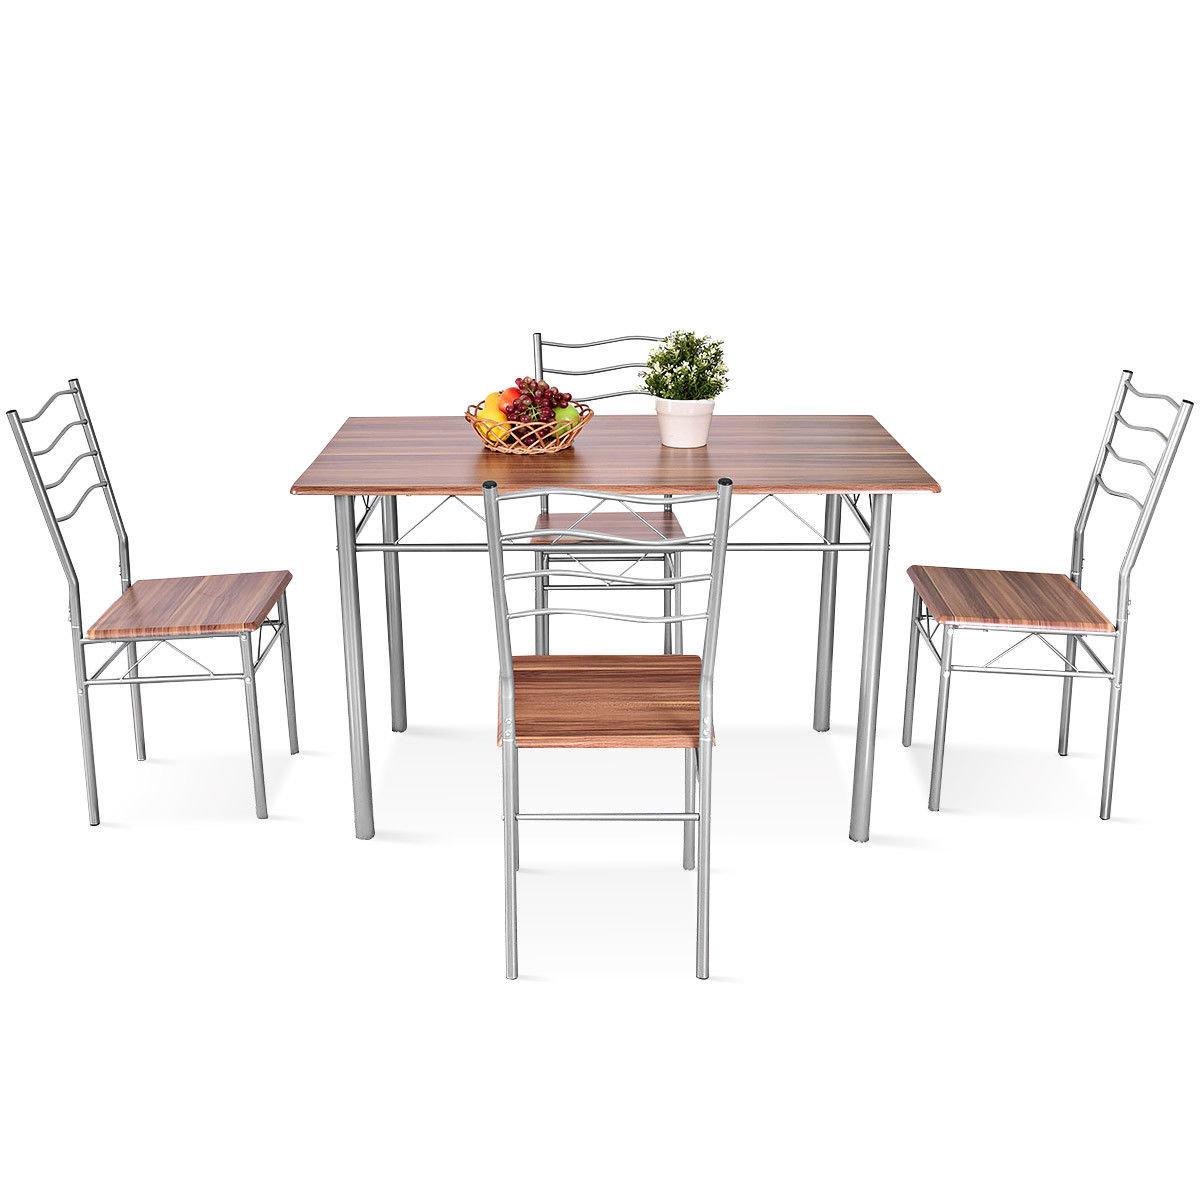 Most Popular Miskell 3 Piece Dining Sets Inside Winston Porter Miskell 5 Piece Dining Set (View 7 of 25)